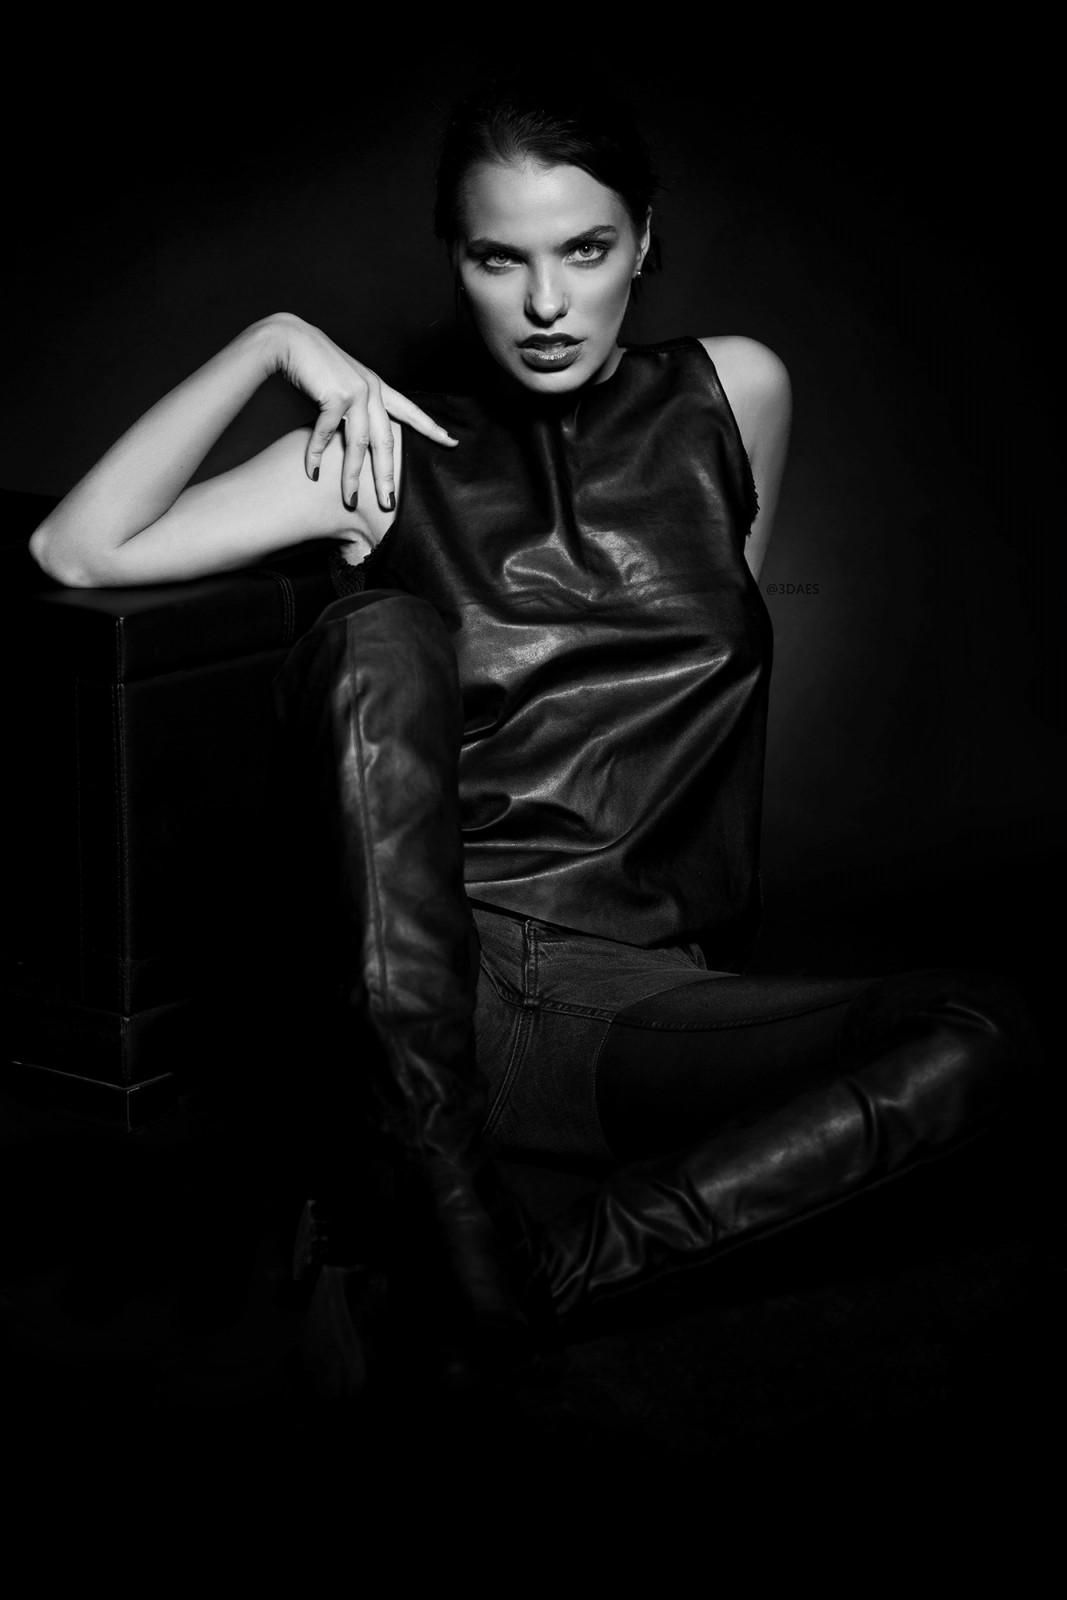 Inga's shoot with Dubai Portrait Photographer